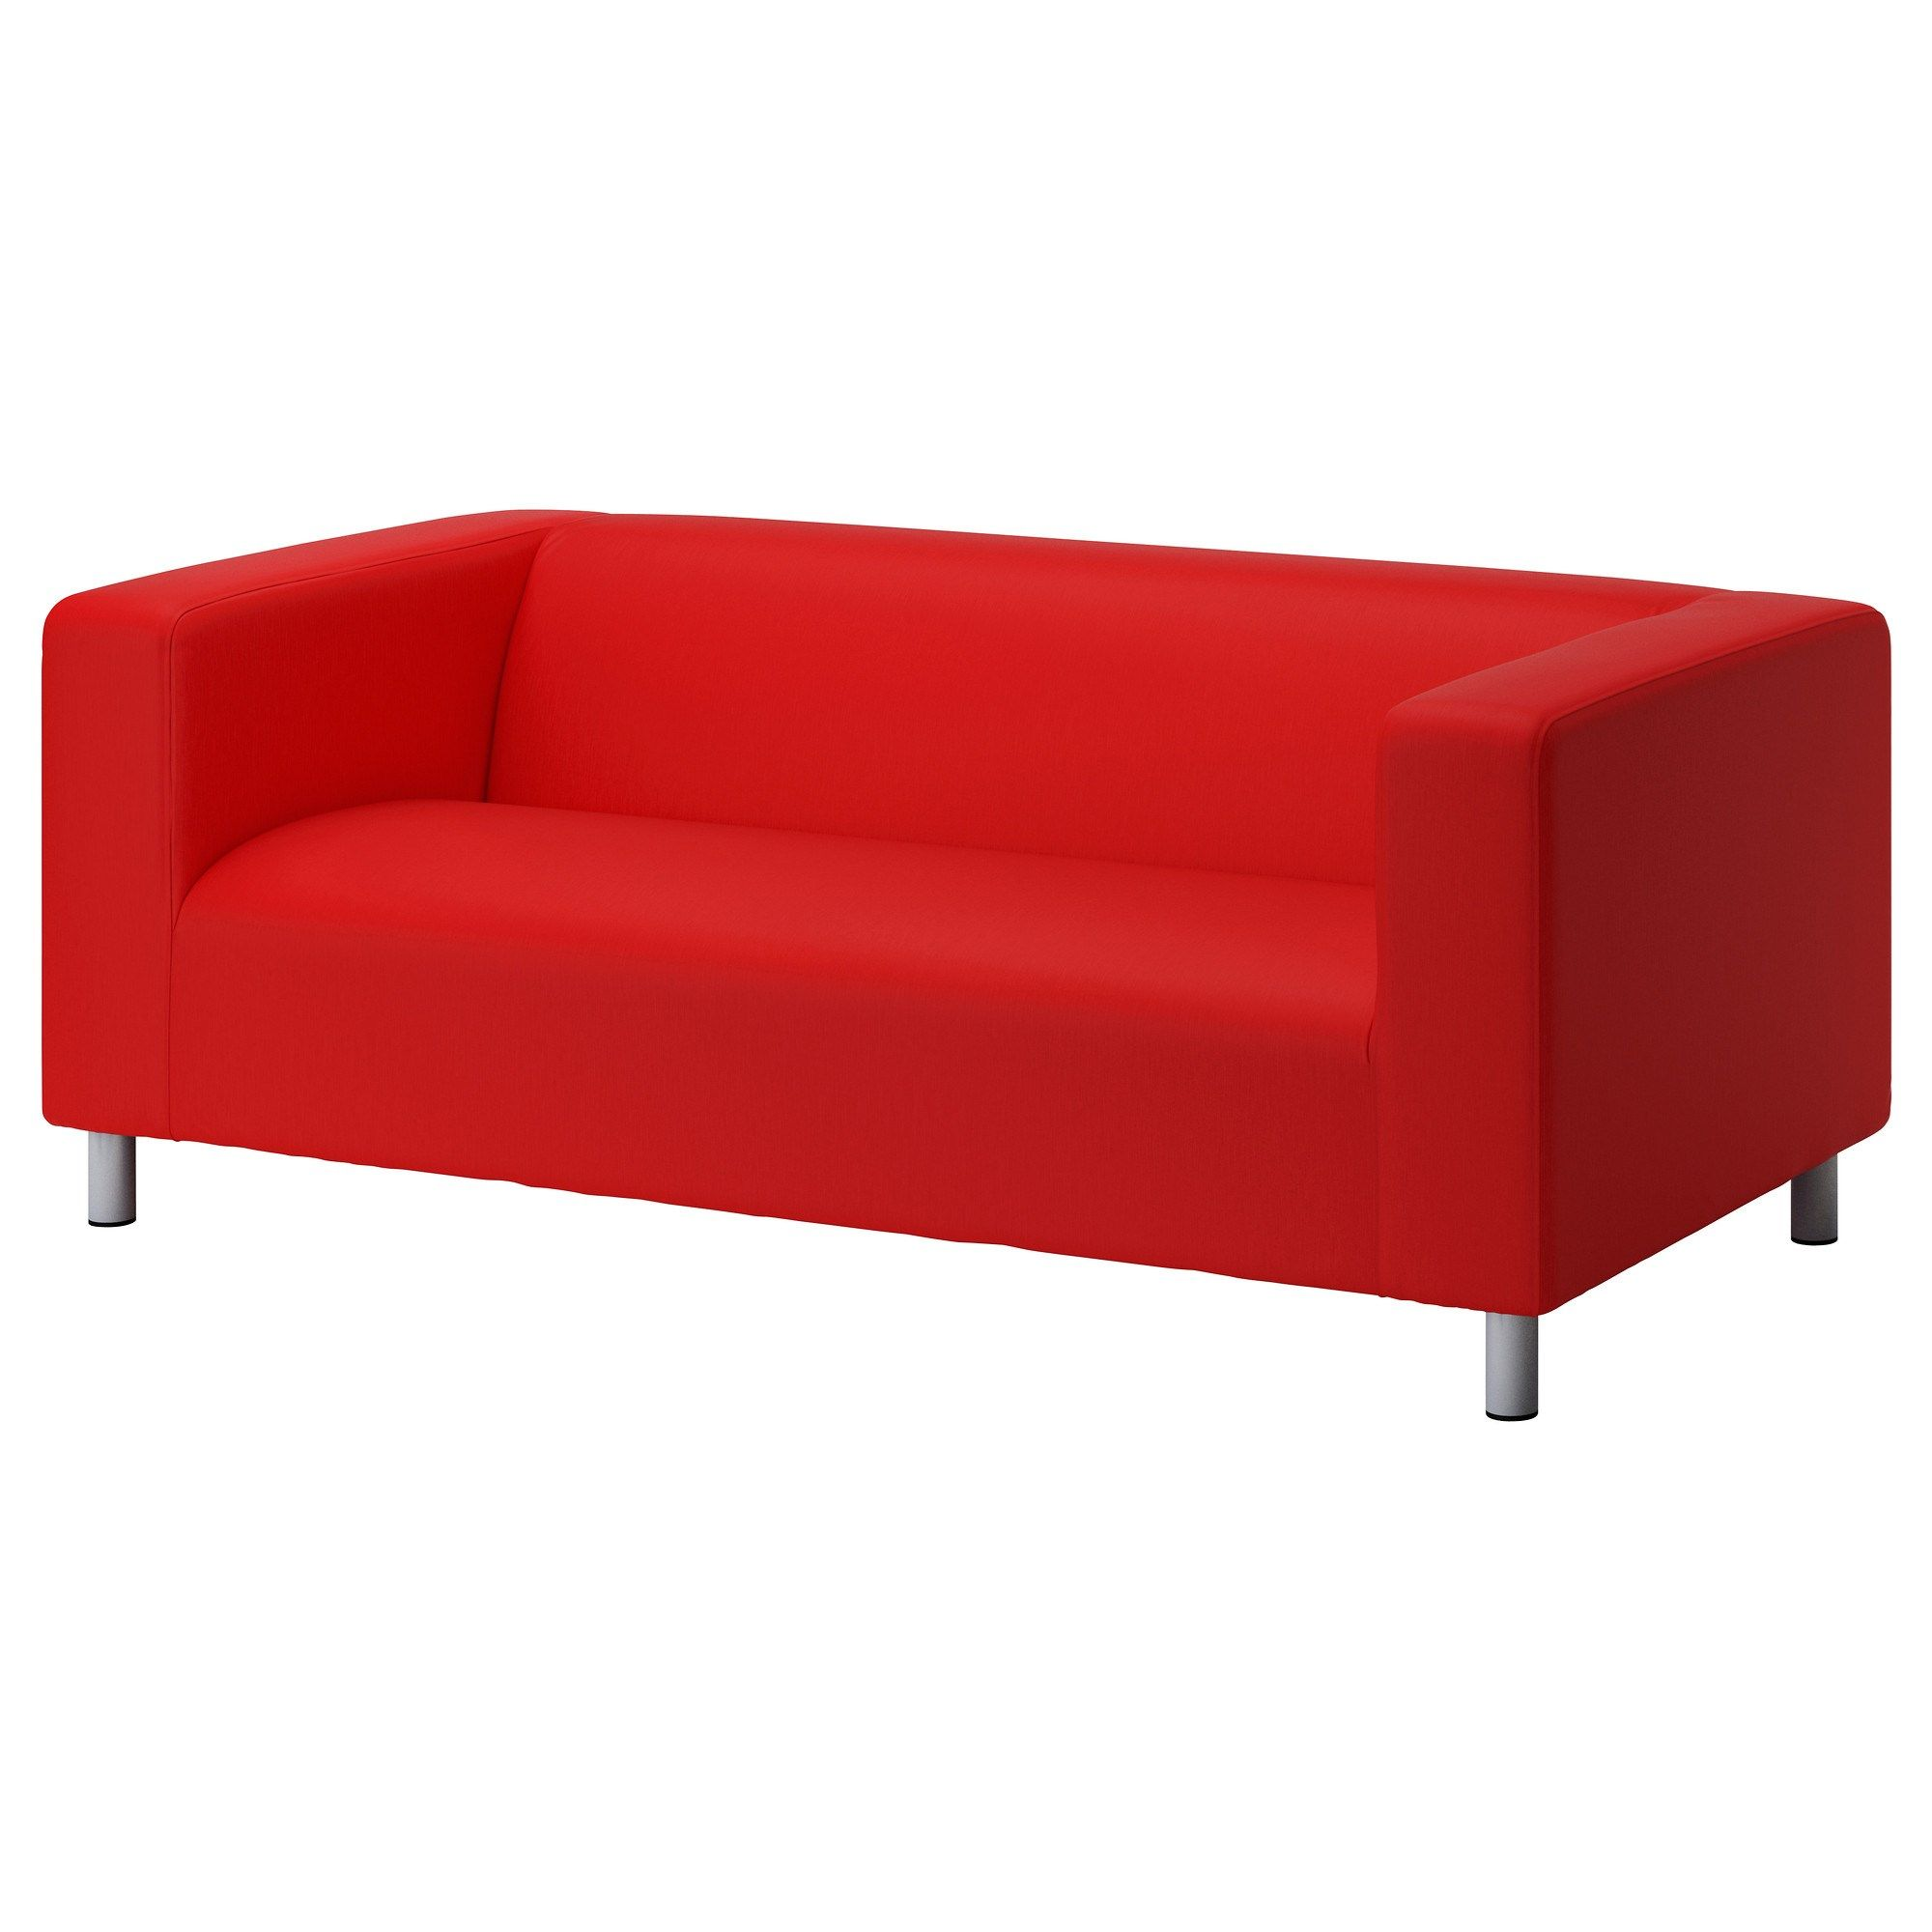 Klippan 2 Li Kanepe Vissle Kirmizi Turuncu Ikea Fikirleri Kanepeler Oturma Odalari